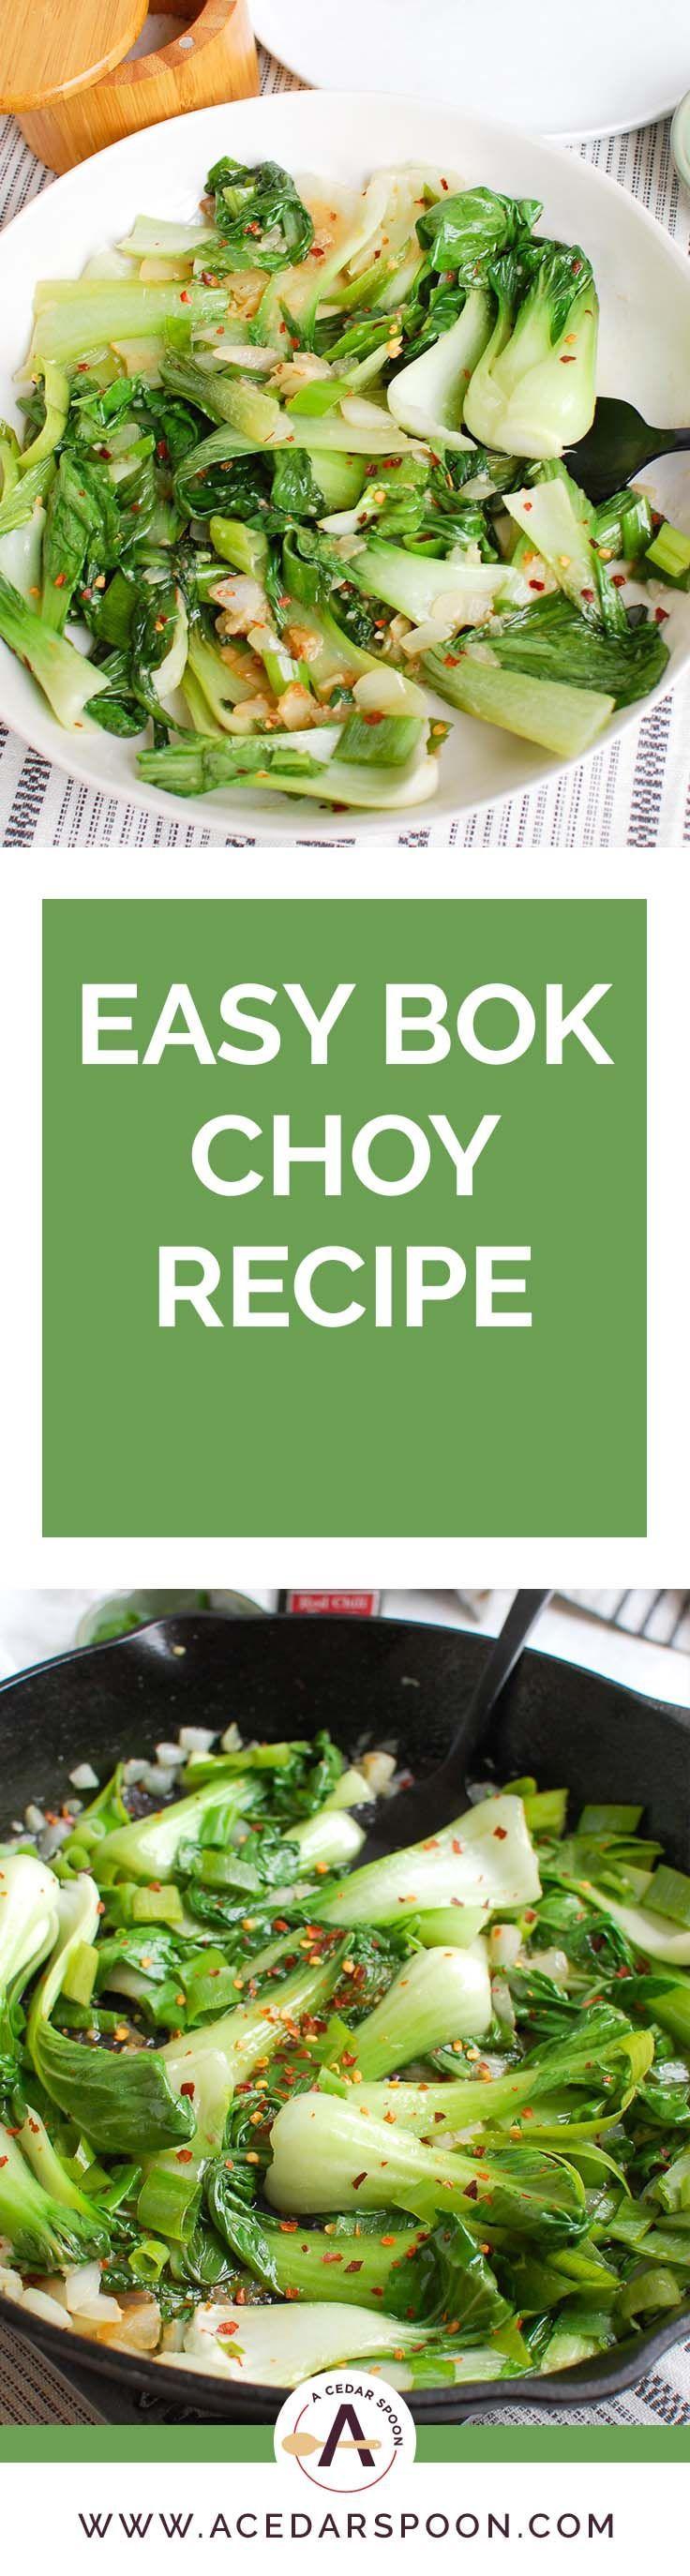 Easy bok choy recipe recipe bok choy recipes easy bok